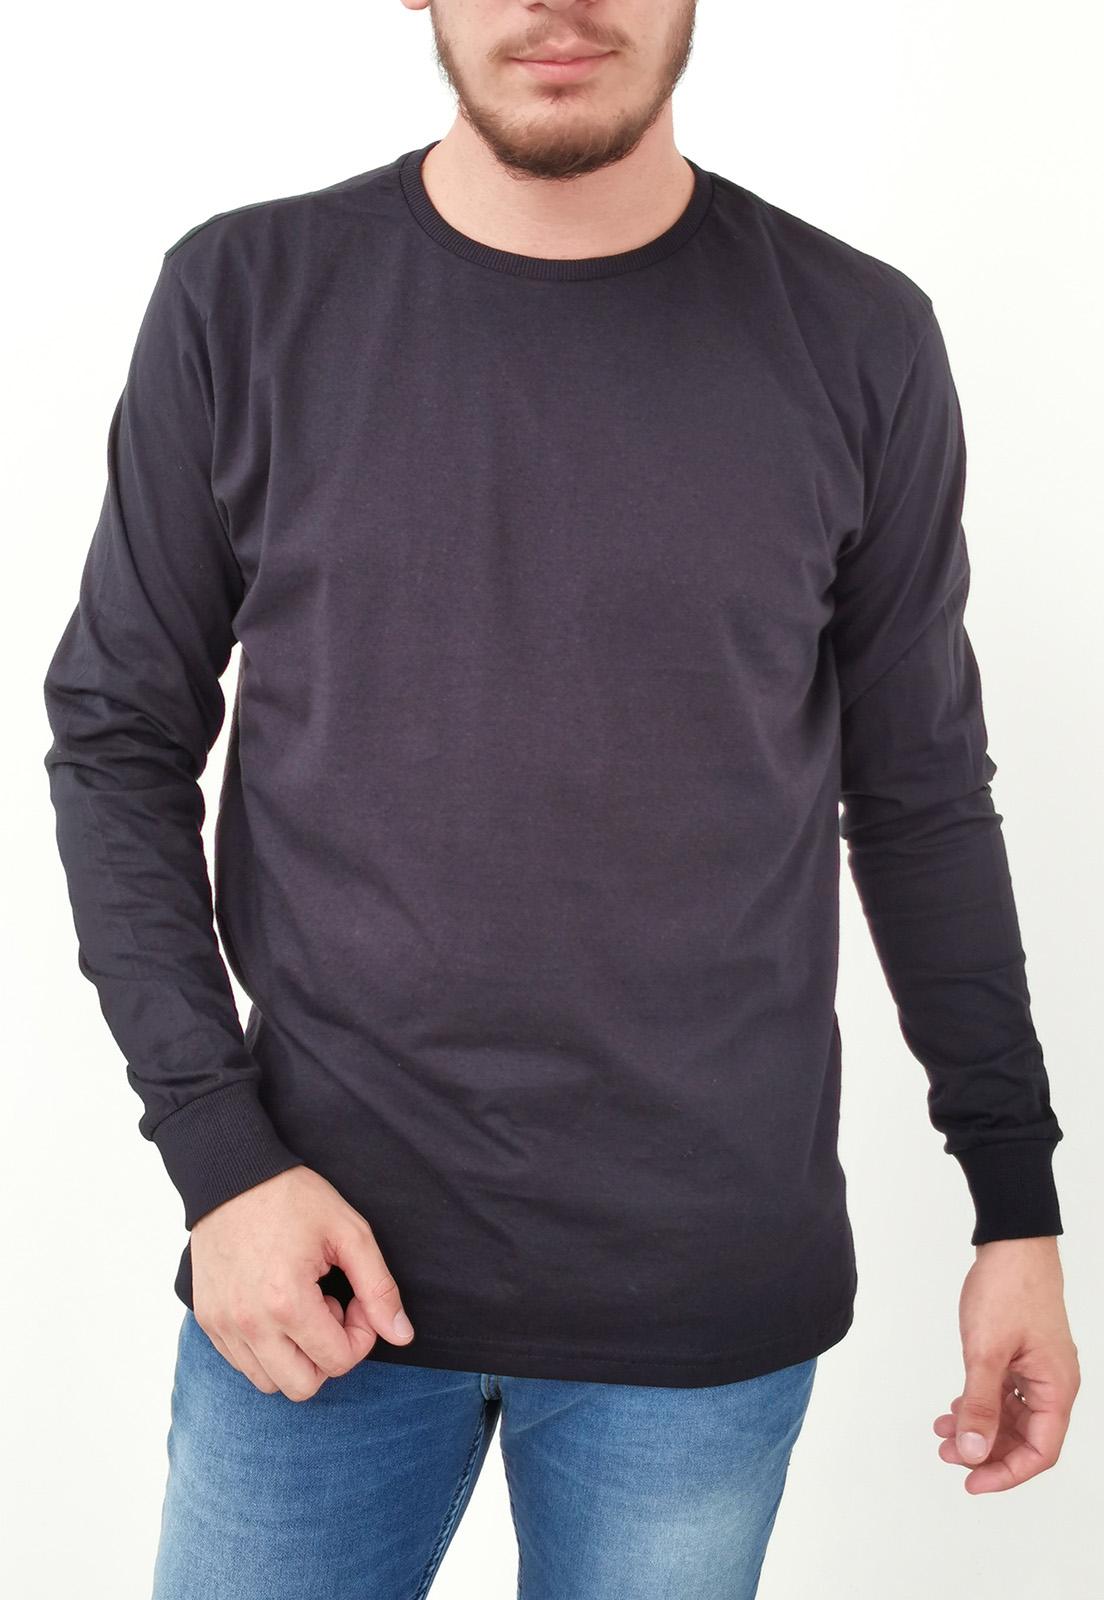 Camiseta Tigs Manga Longa Preto Básica